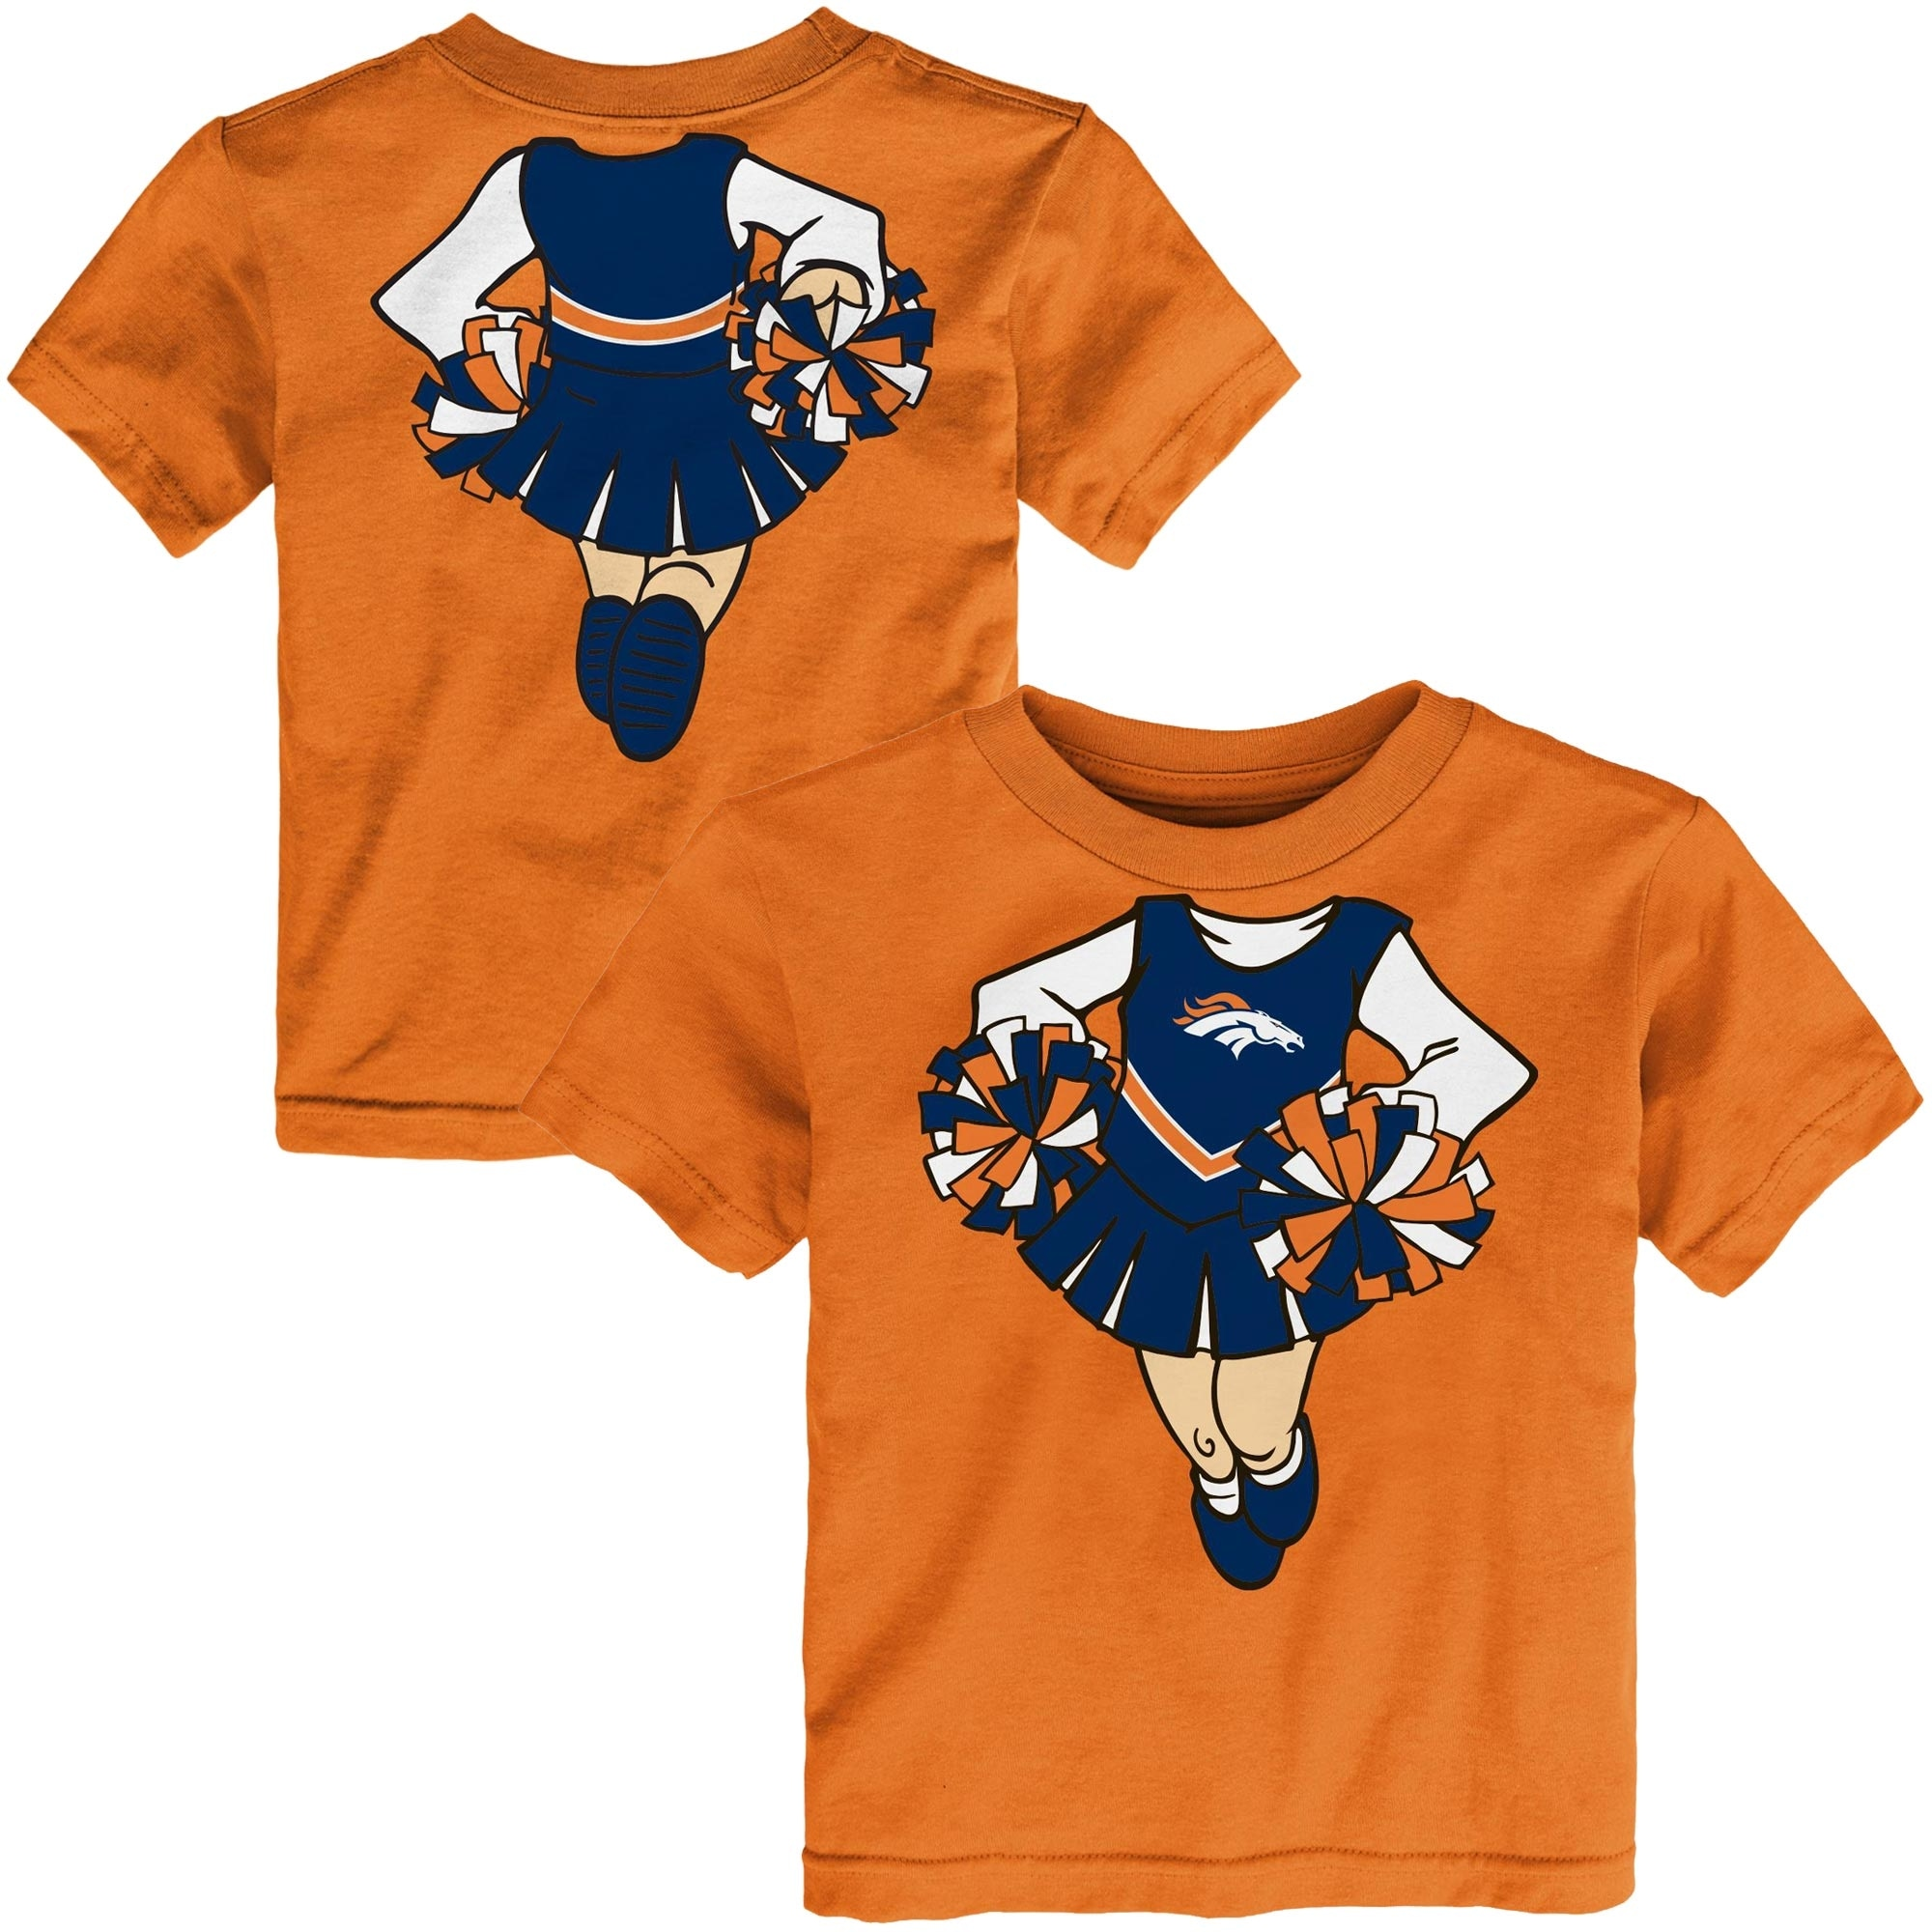 Denver Broncos Girls Toddler Cheerleader Dreams T-Shirt - Orange